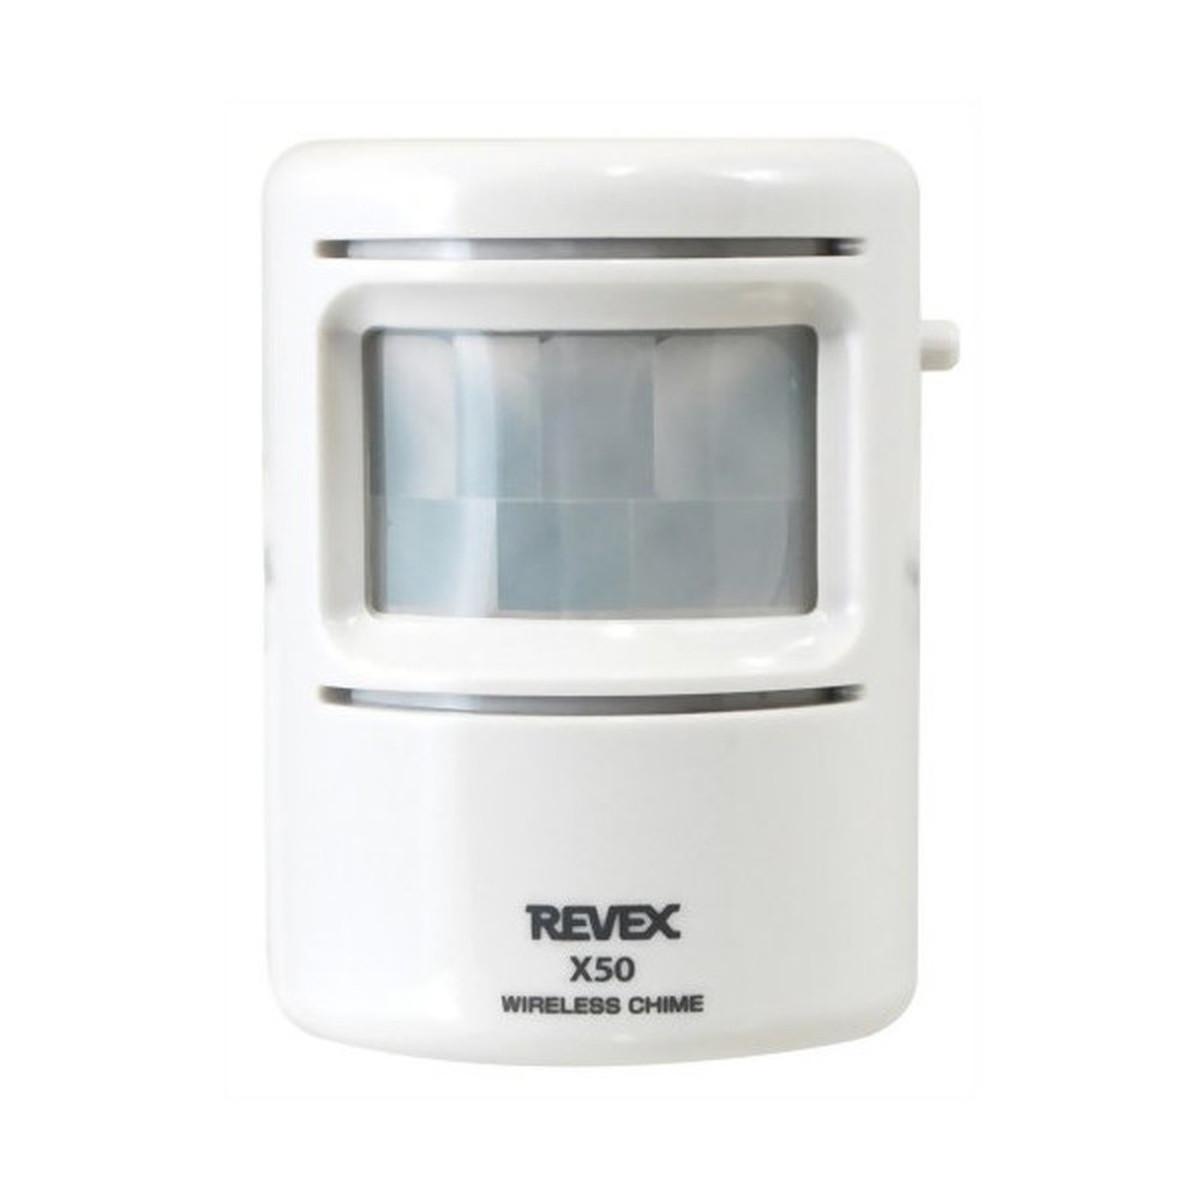 X800 REVEXワイヤレスチャイムXシリーズ 「人感送信機 X50」 315MHz帯 特定小電力【クーポン配布中】